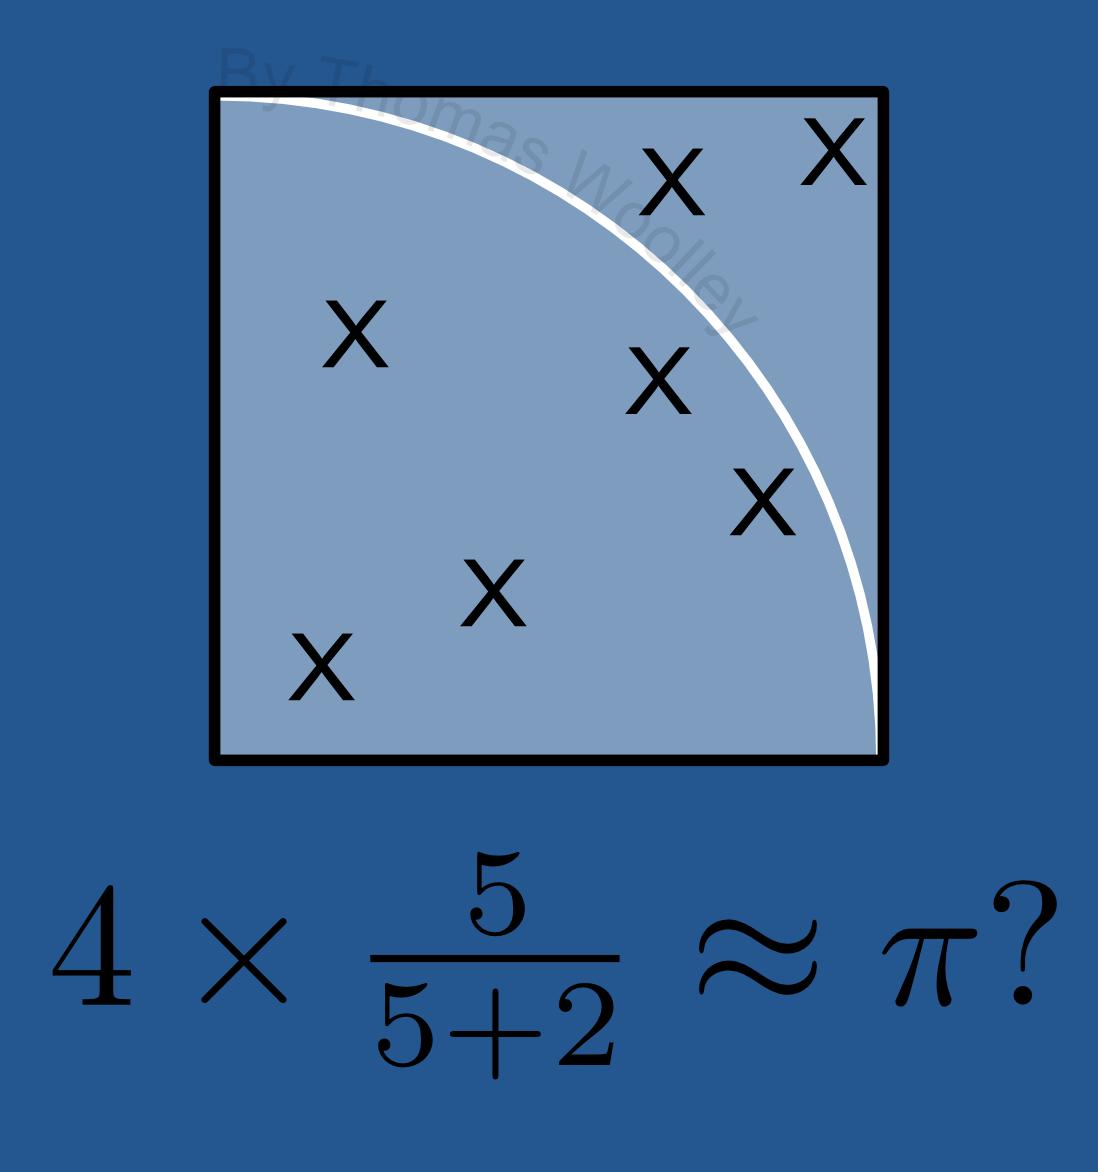 Wallpaper Drop Calculator Download Wallpaper DaWallpaperz 1098x1172